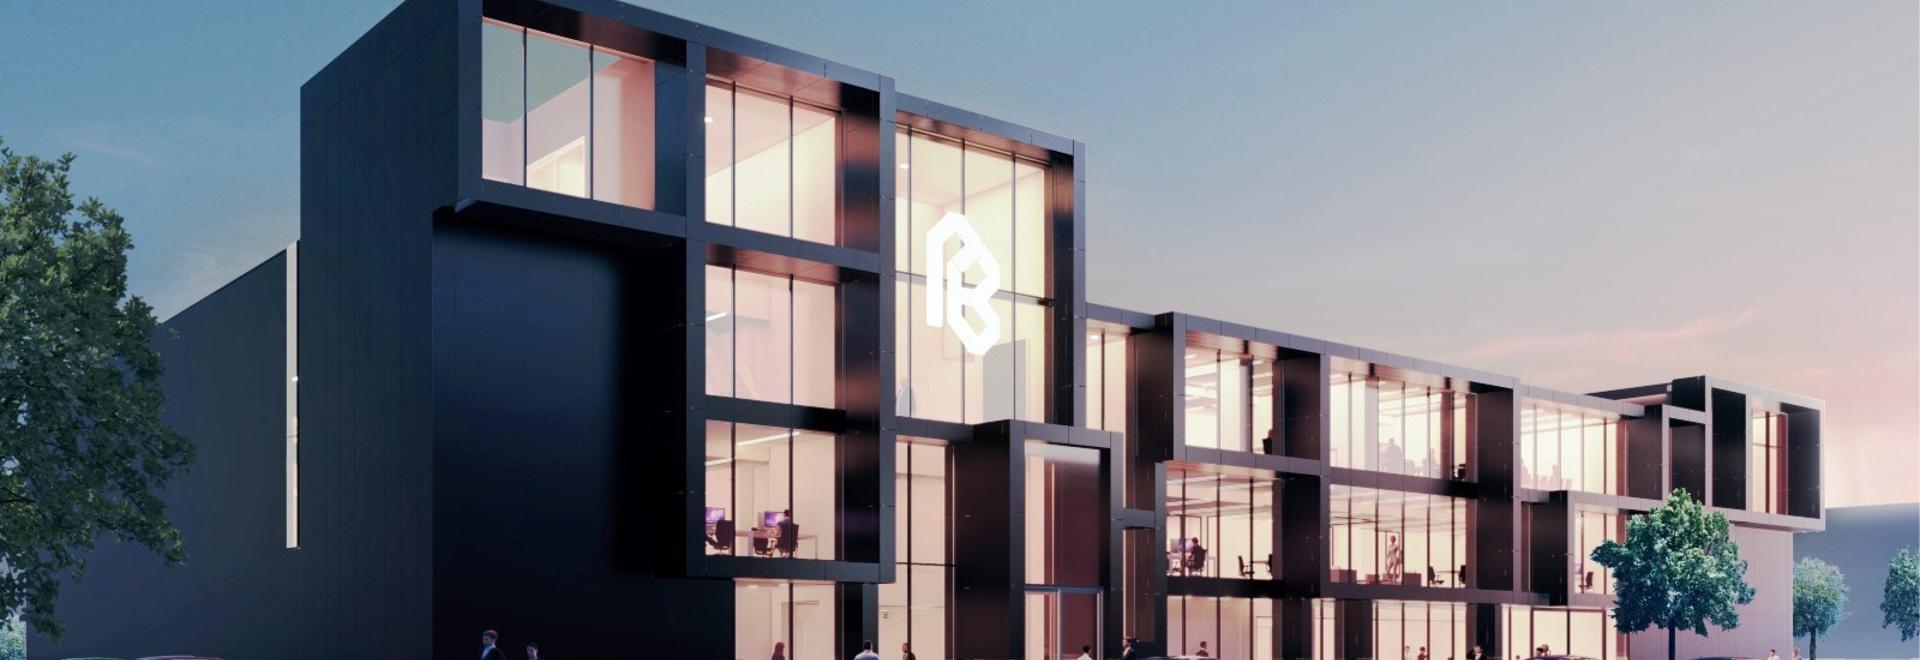 Edificio de oficinas icónico en Maasdijk by MoederscheimMoonen Architects